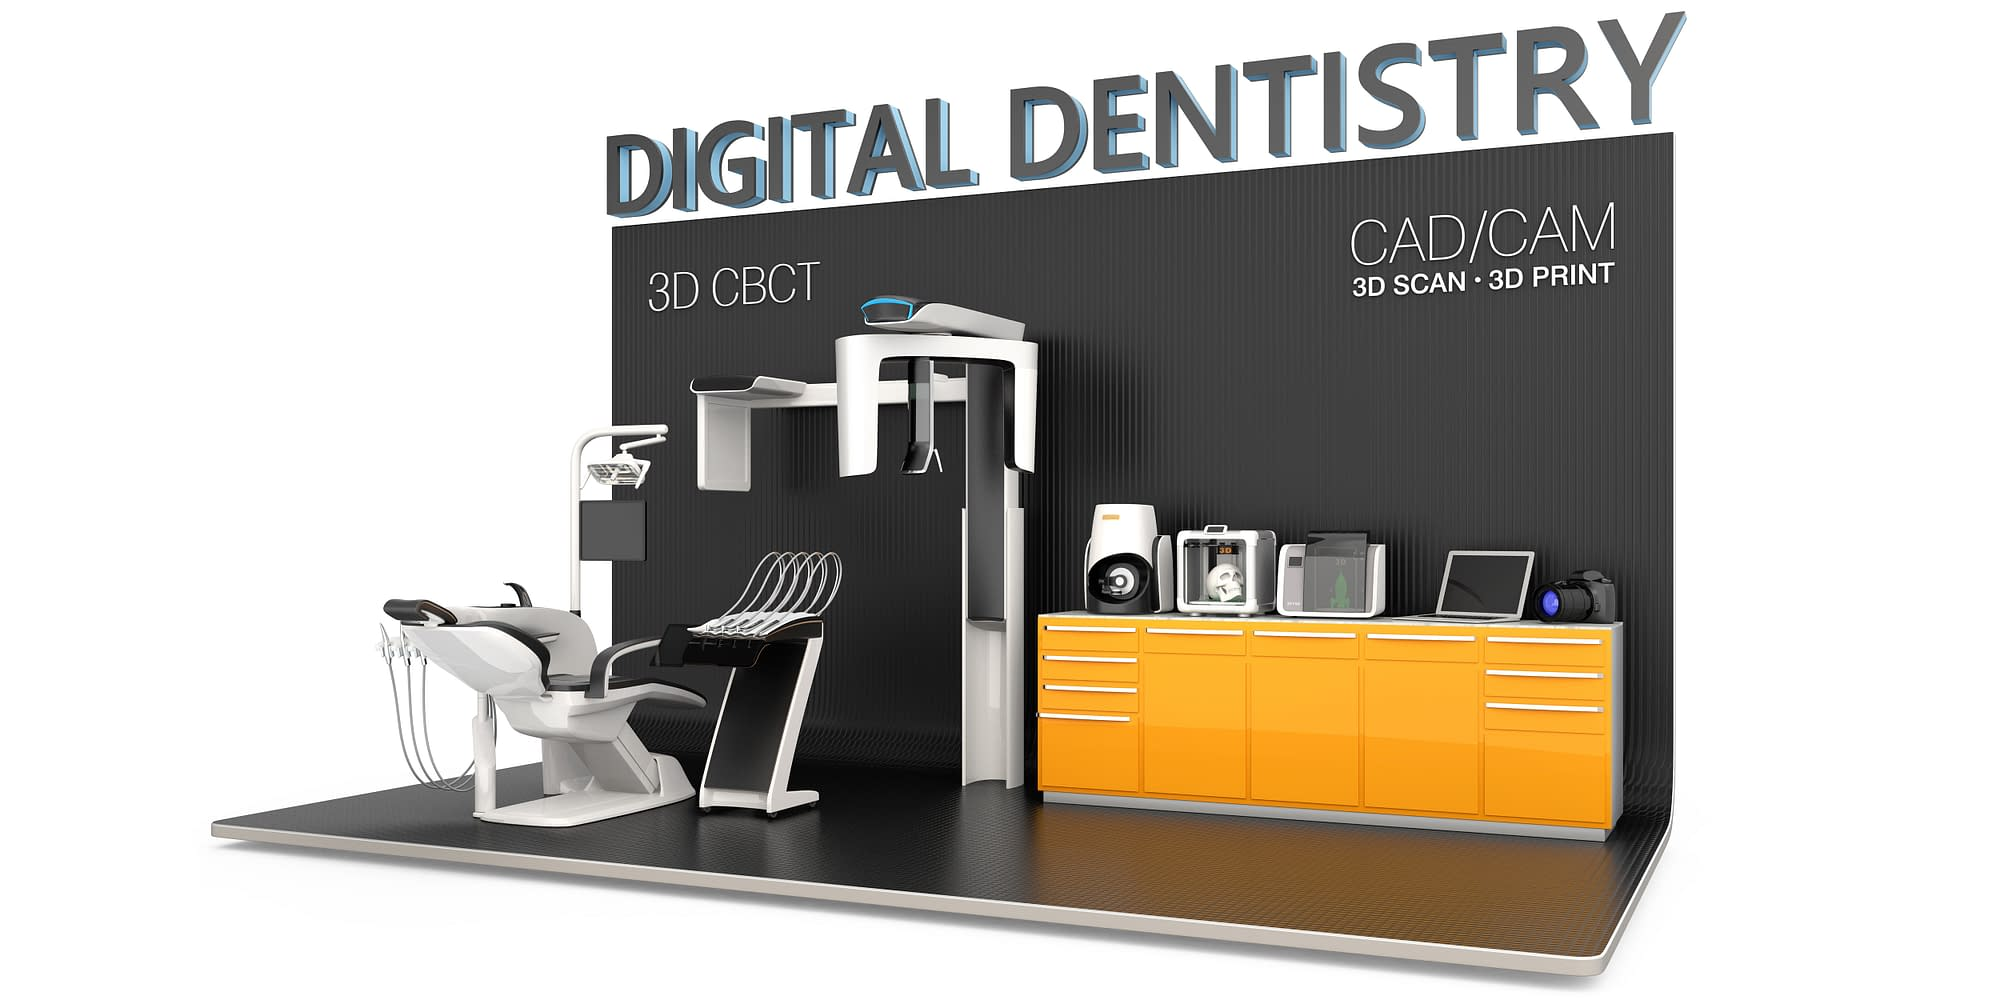 Digital Dentistry at Kingdom Clinic